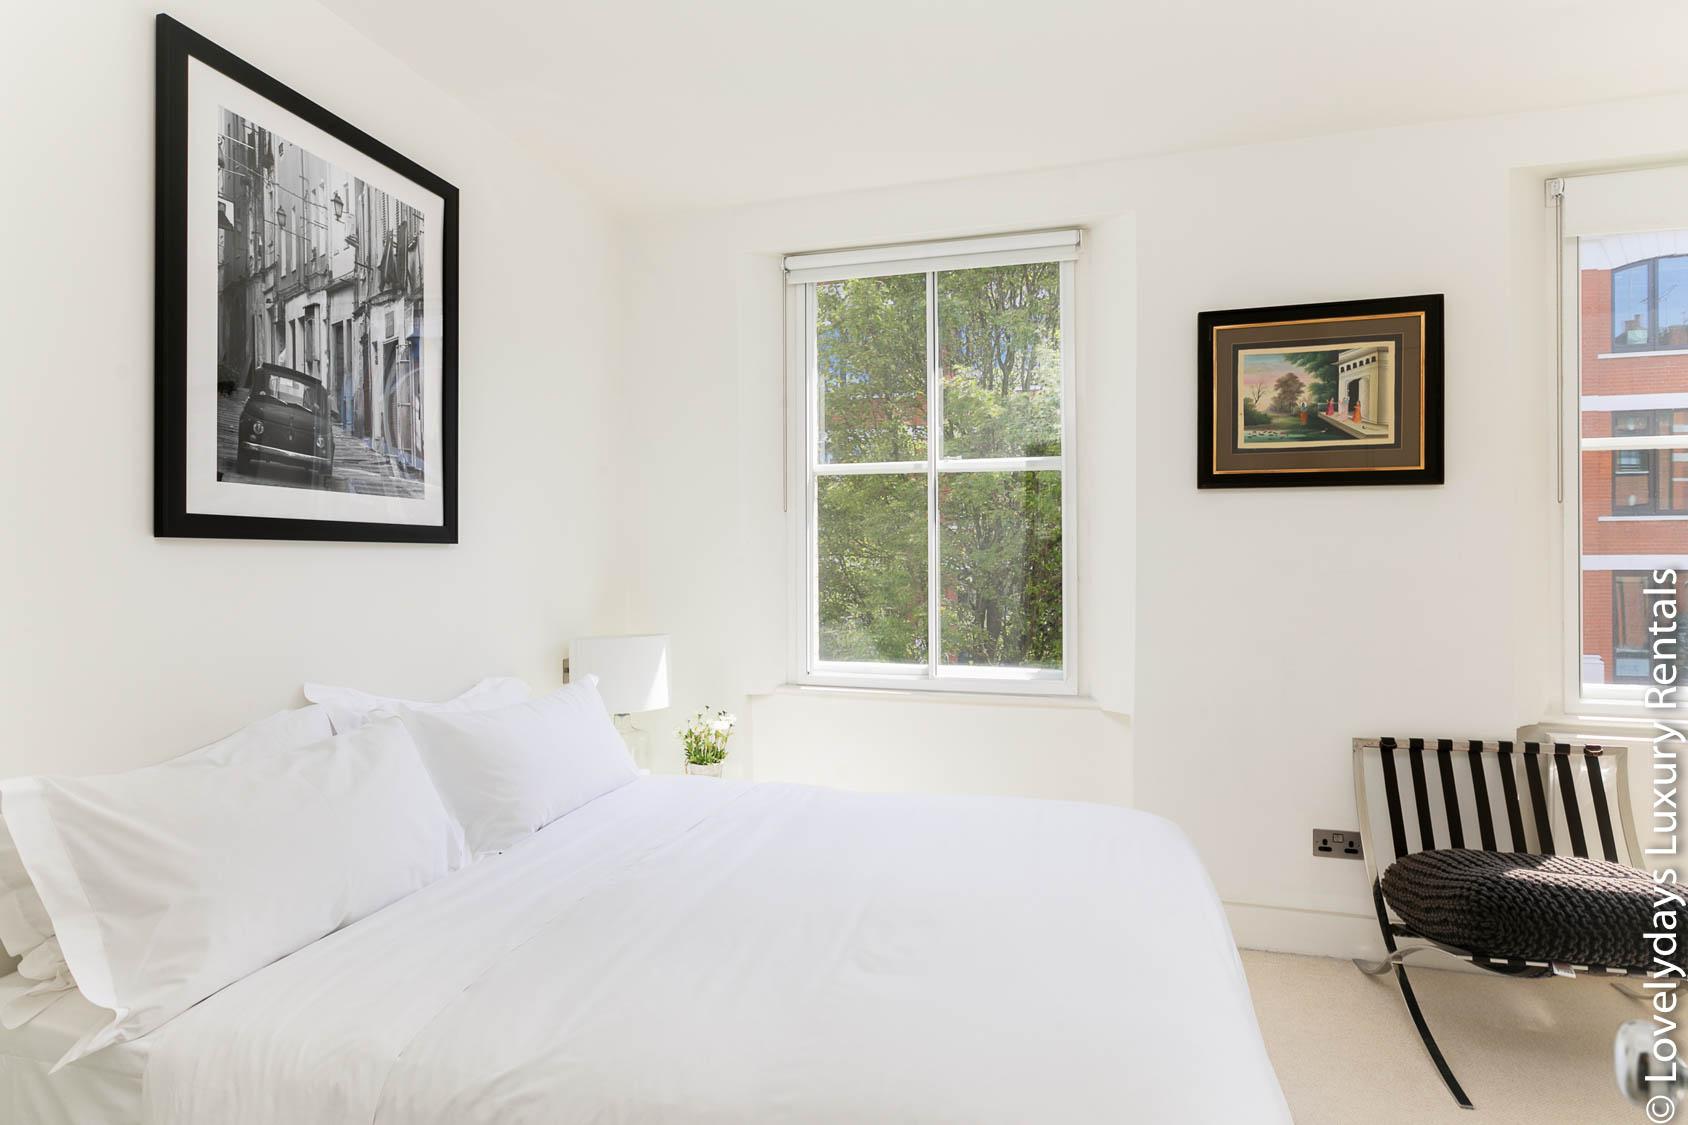 Lovelydays luxury service apartment rental - London - Fitzrovia - Foley Street - Lovelysuite - 2 bedrooms - 2 bathrooms - Double bed - 5403f06a5b87 - Lovelydays